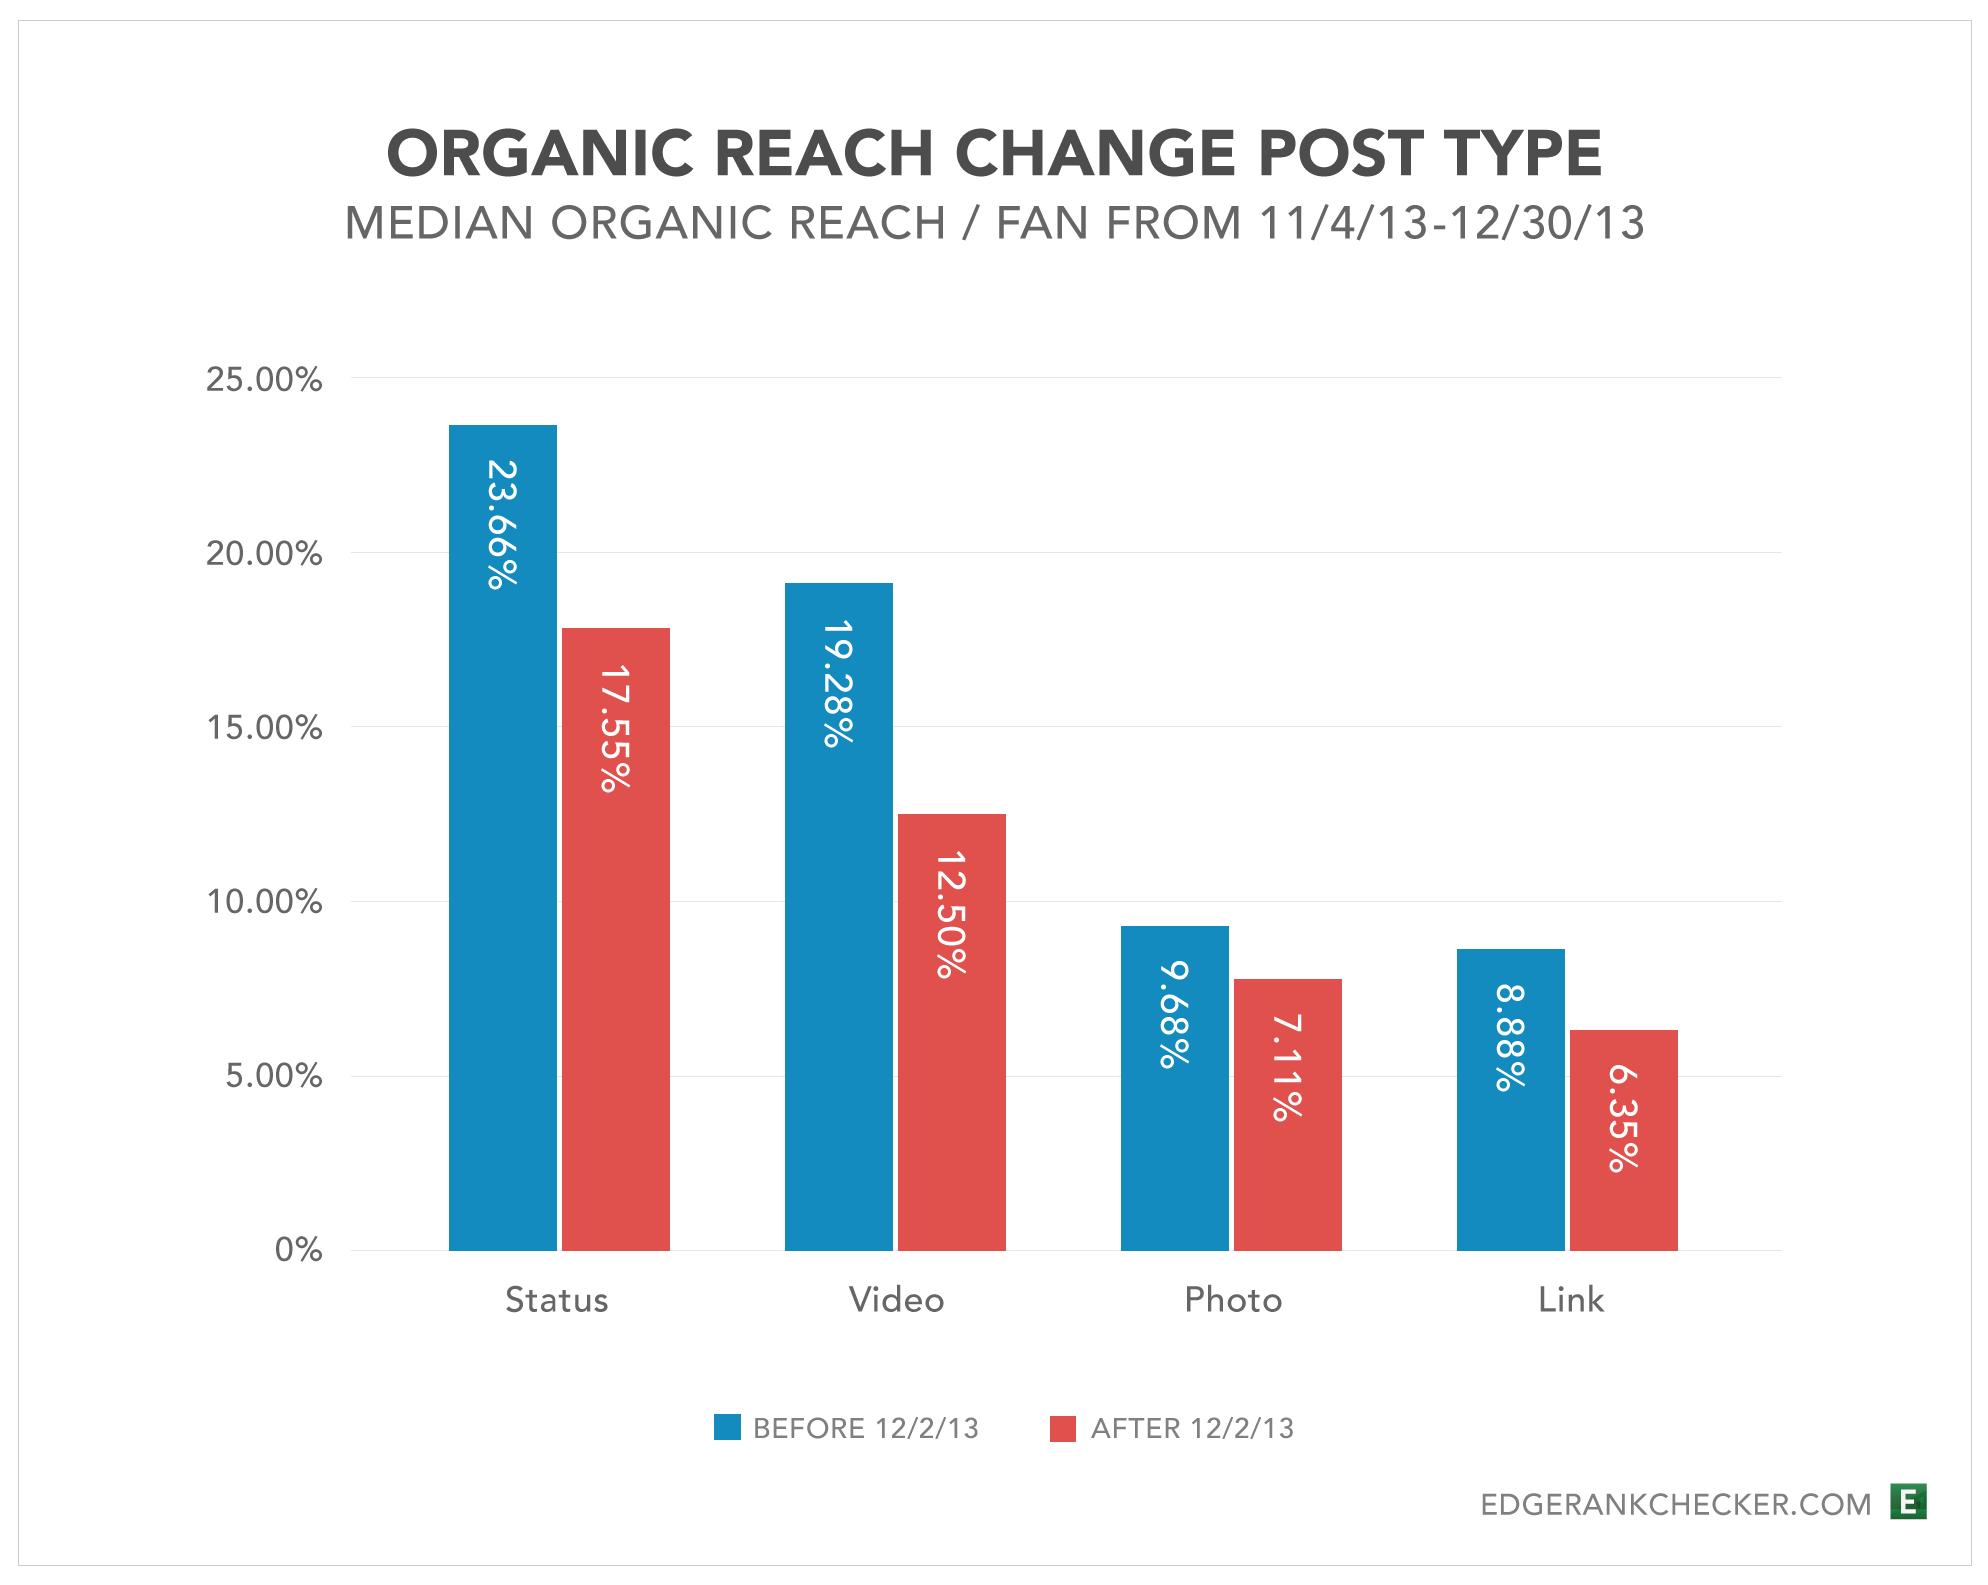 Organic reach change post type